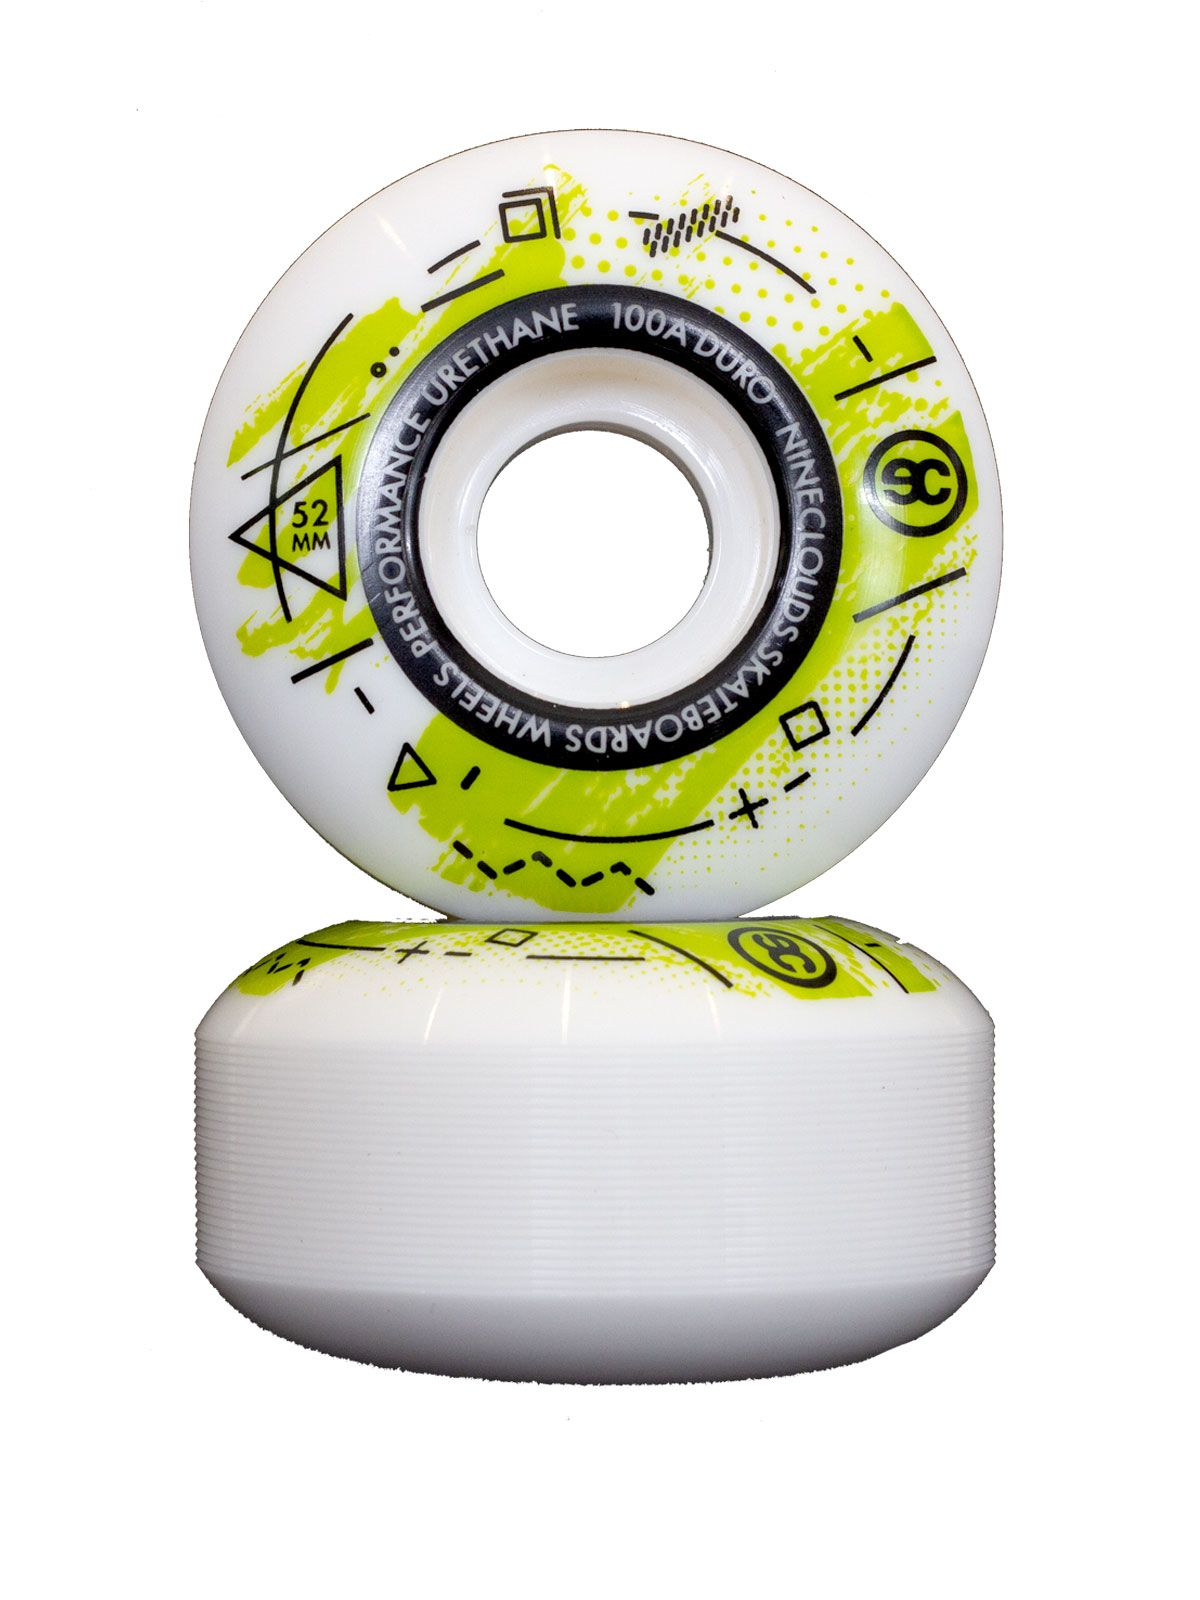 rodas-nineclouds-neon-52-1-image